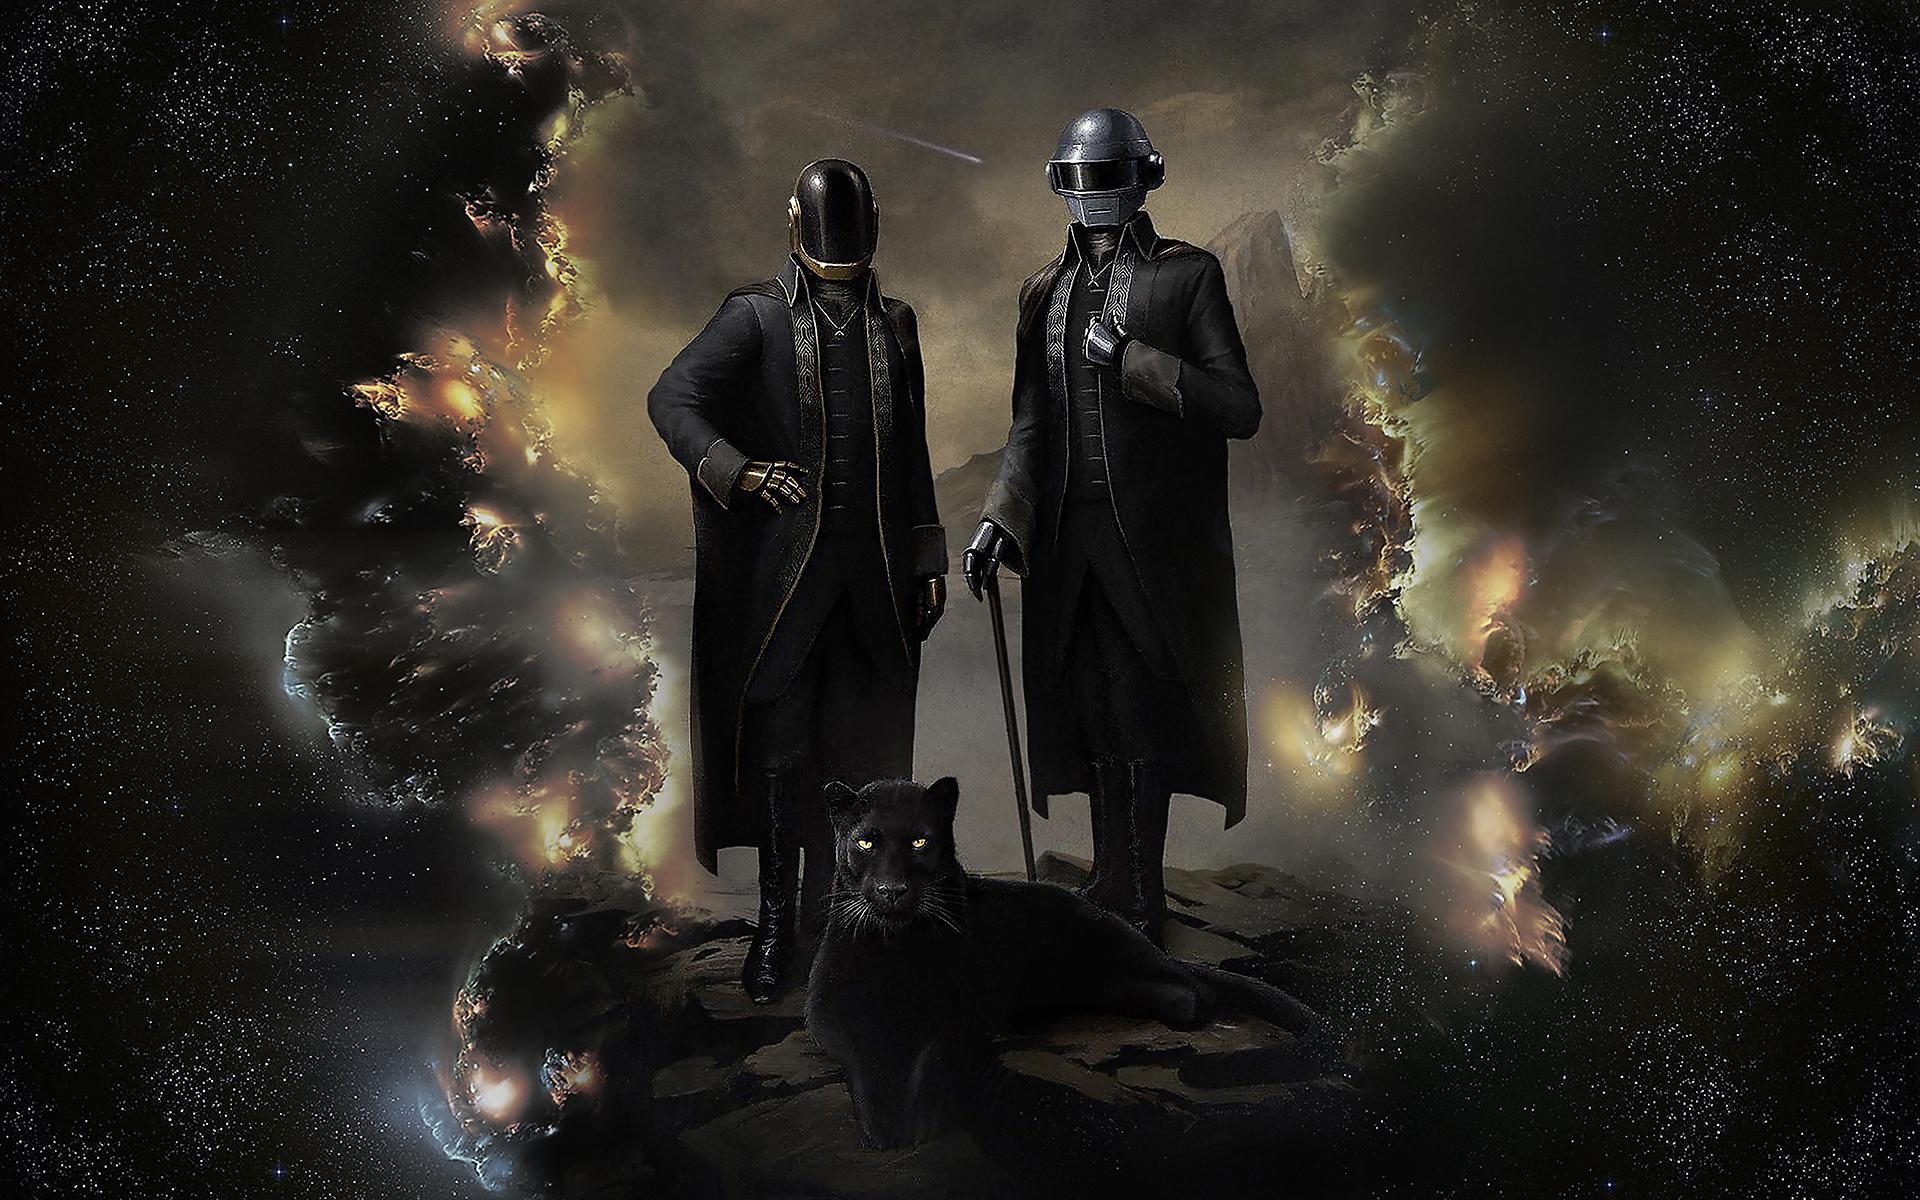 Wallpaper : Daft Punk, panthers, helmet, DJ, suits, music ...